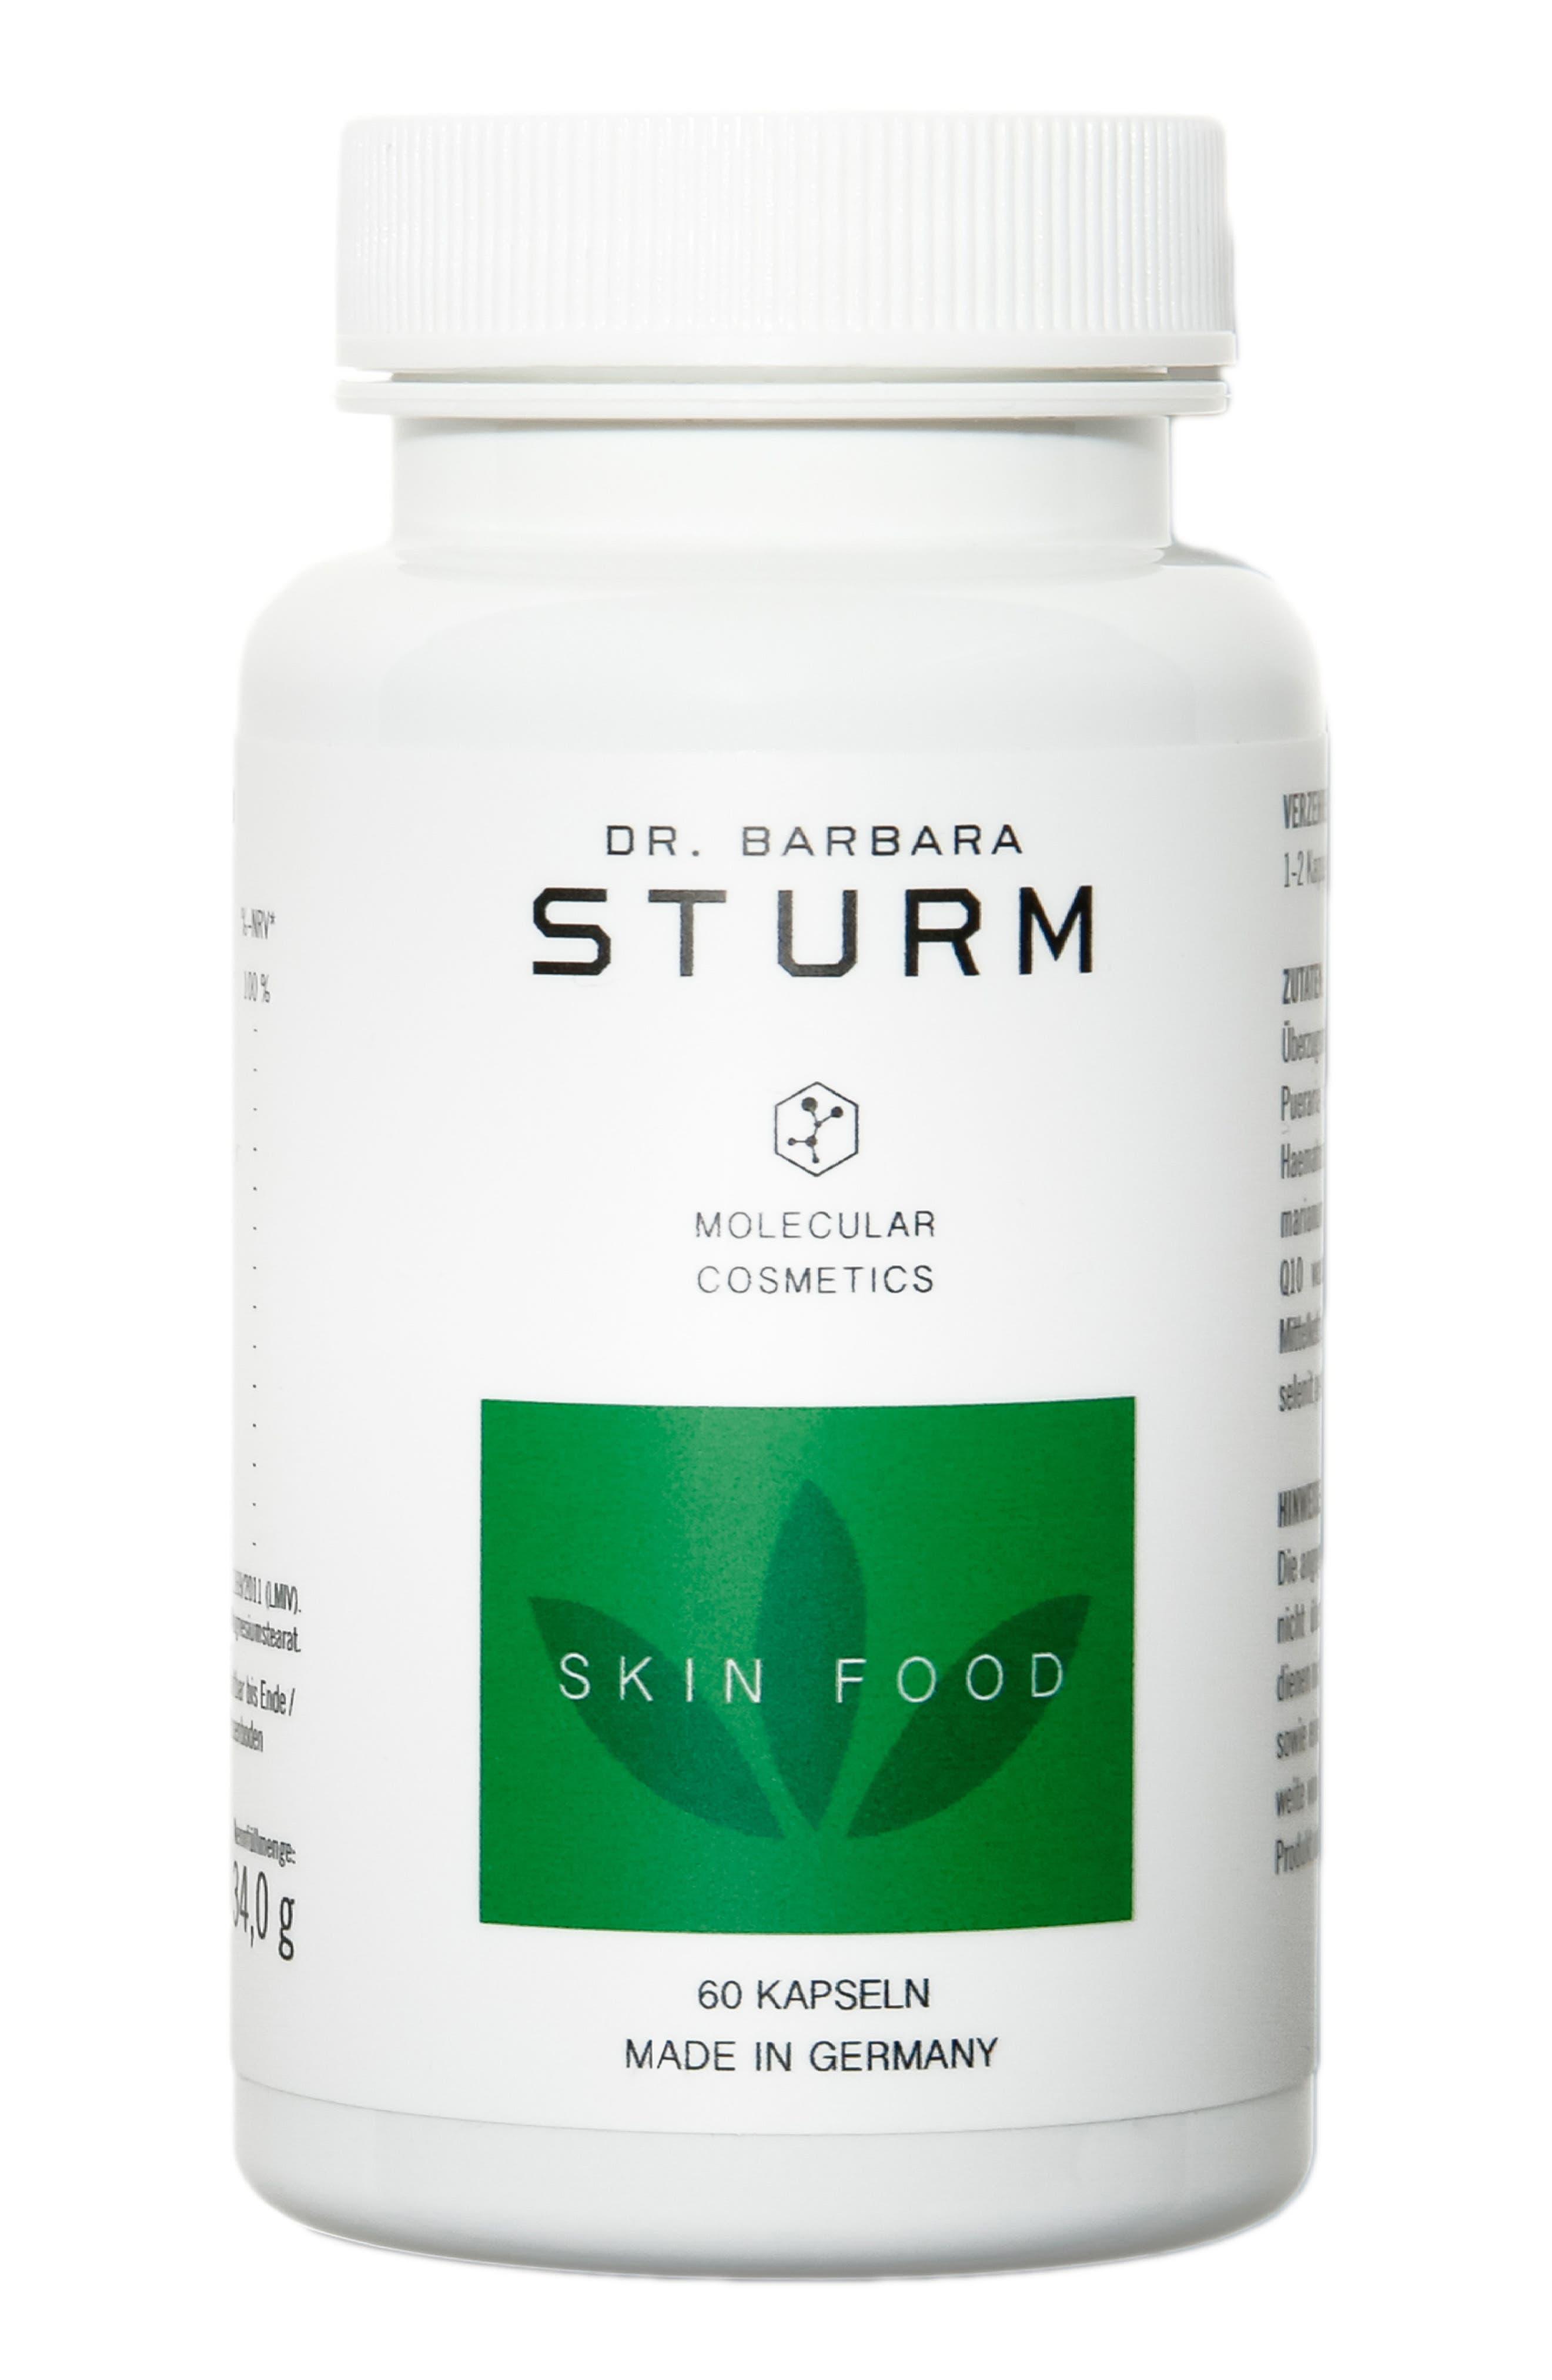 Skin Food by Dr. Barbara Sturm